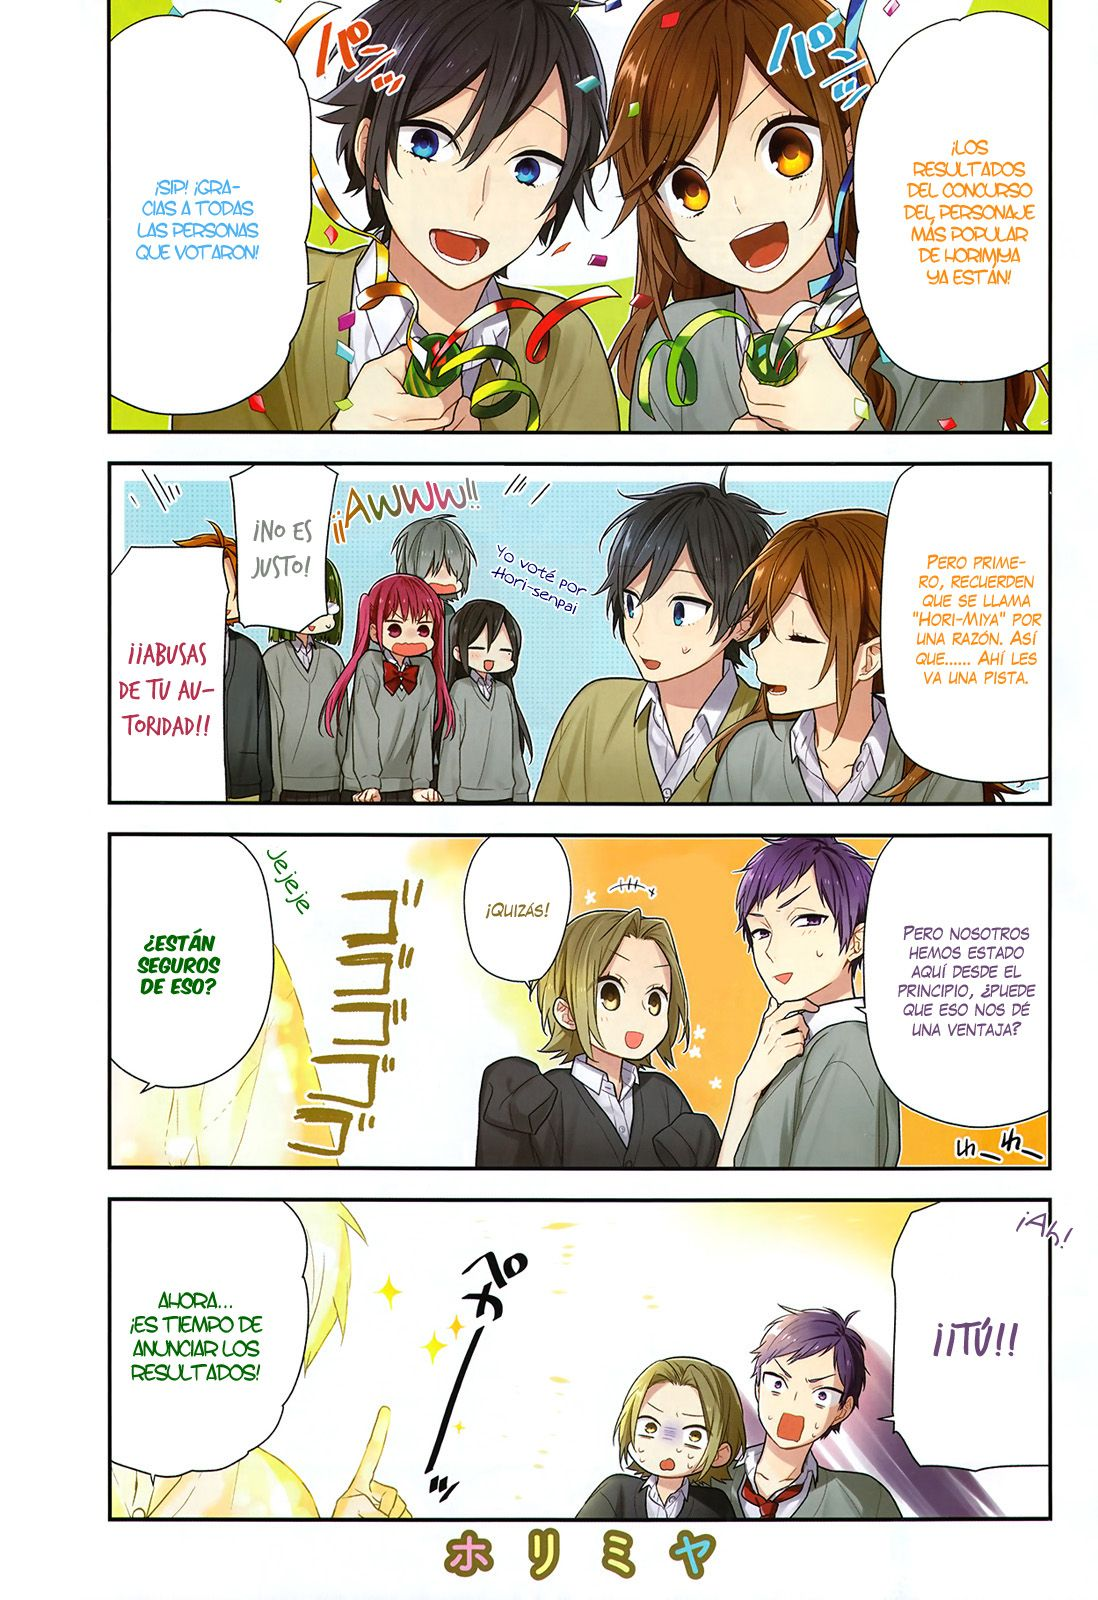 http://c5.ninemanga.com/es_manga/pic2/19/1043/524184/890973130462af2153df8712d607d70b.jpg Page 3